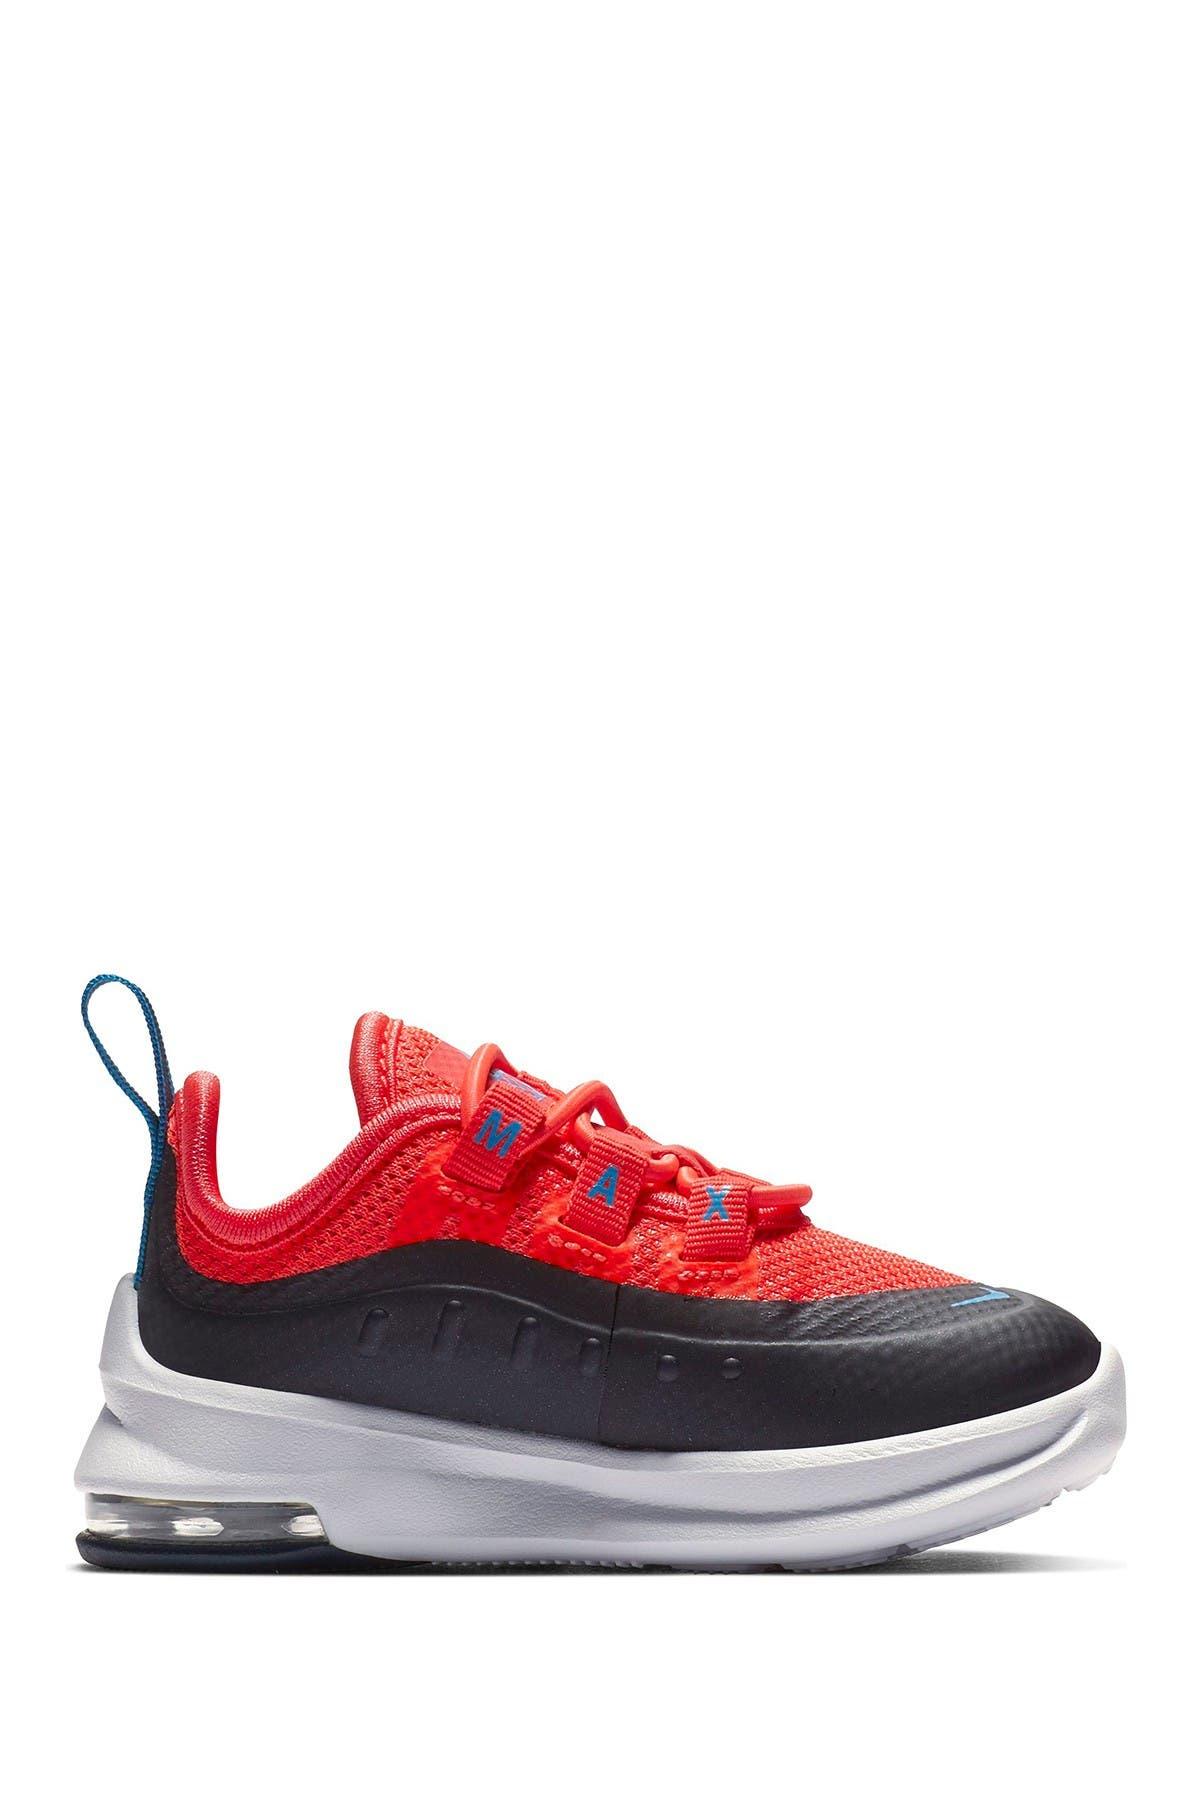 Nike | Air Max Axis Sneaker | Nordstrom